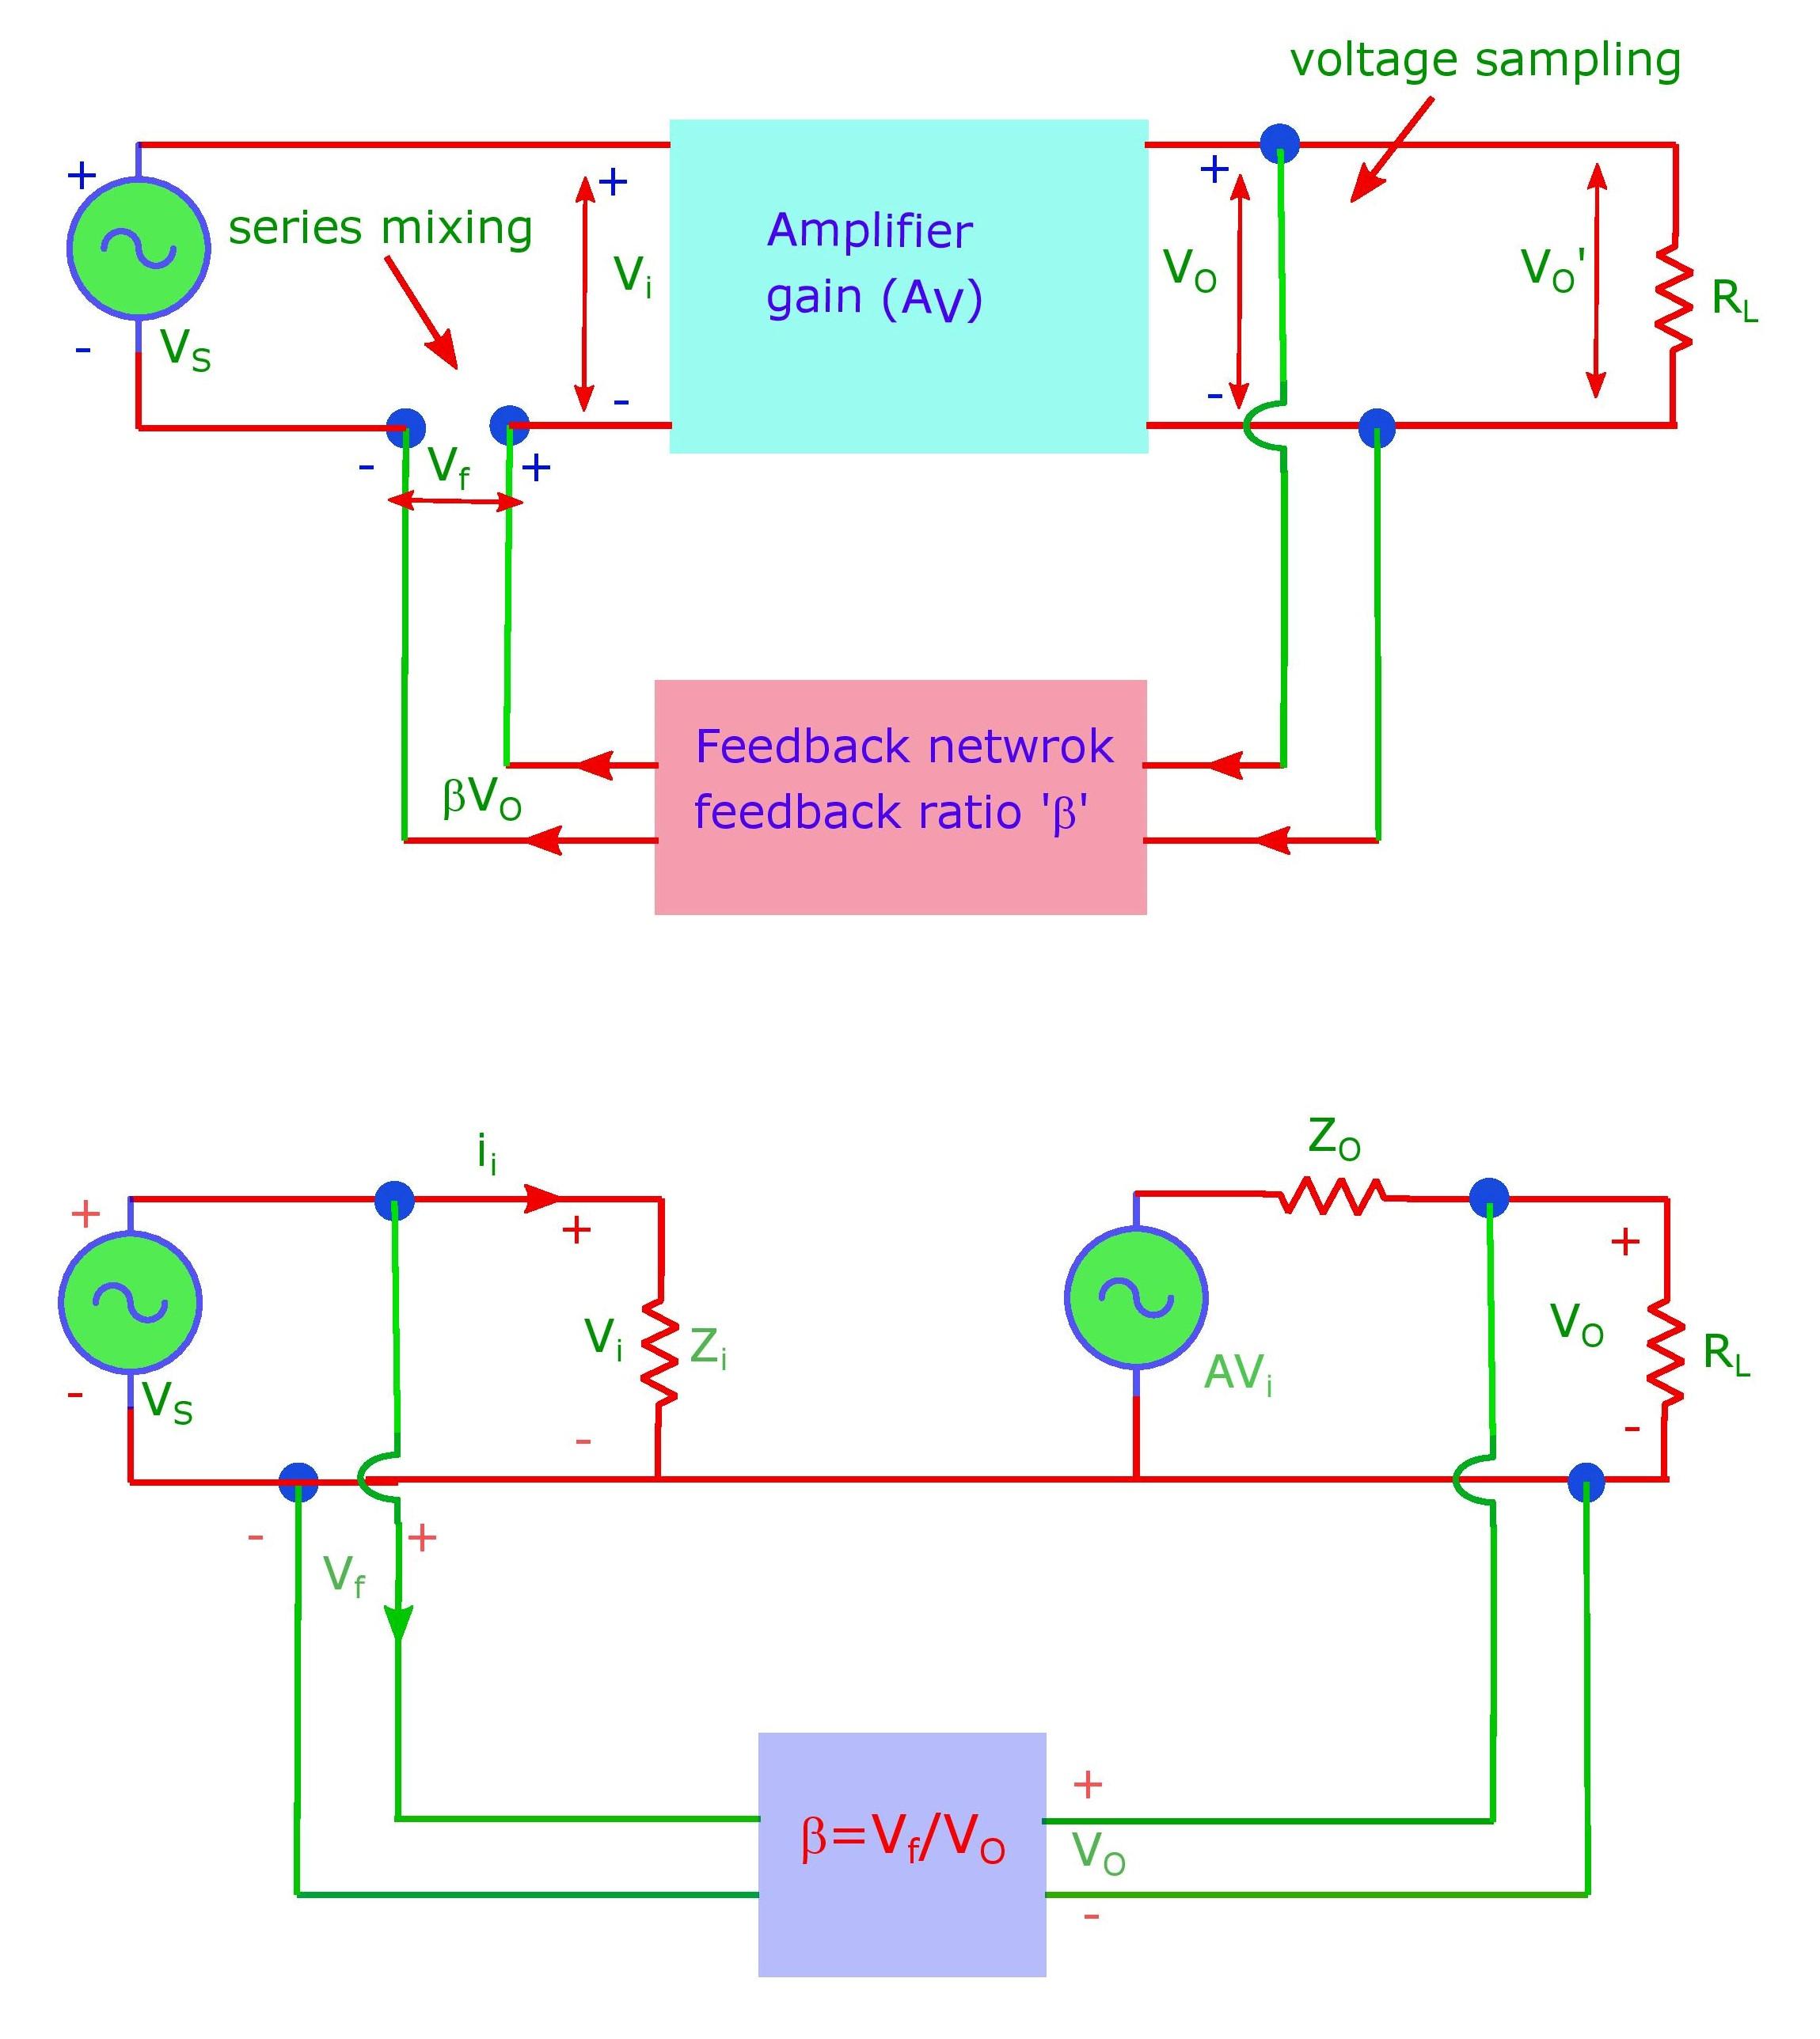 The voltage sampling voltage mixing type feedback amplifier.